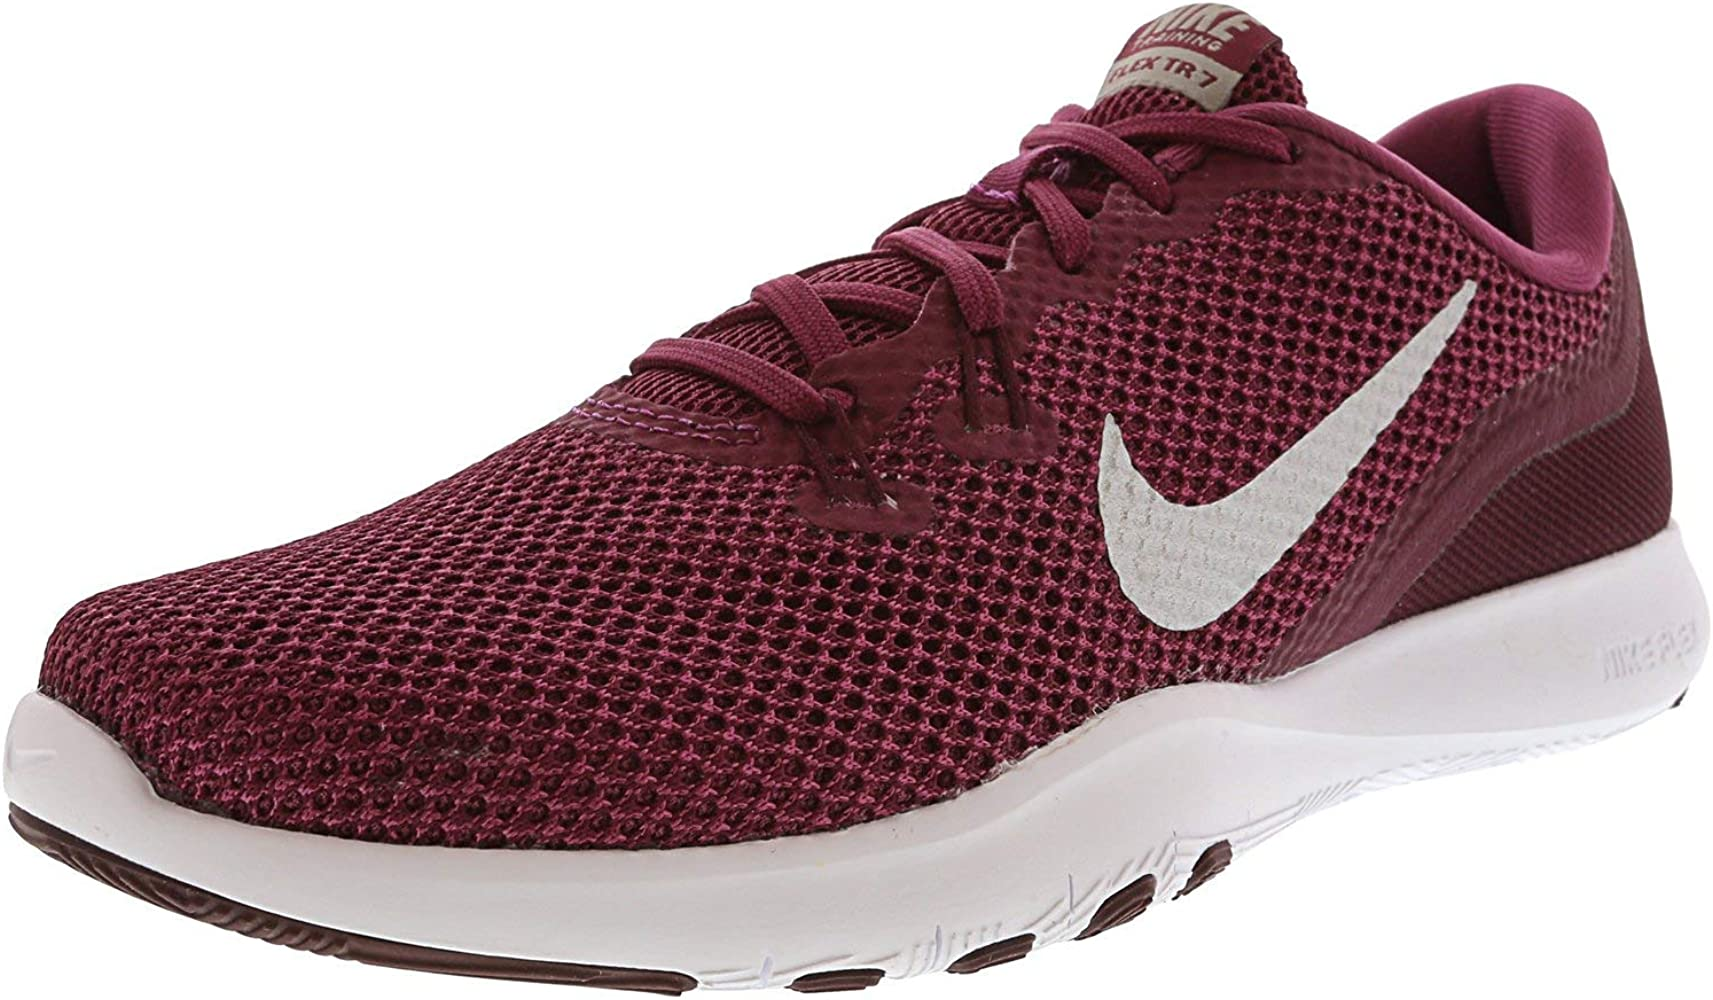 38add6af98389 Women's Flex Trainer 7 Tea Berry/Metallic Silver Ankle-High Fabric Running  Shoe - 8.5M